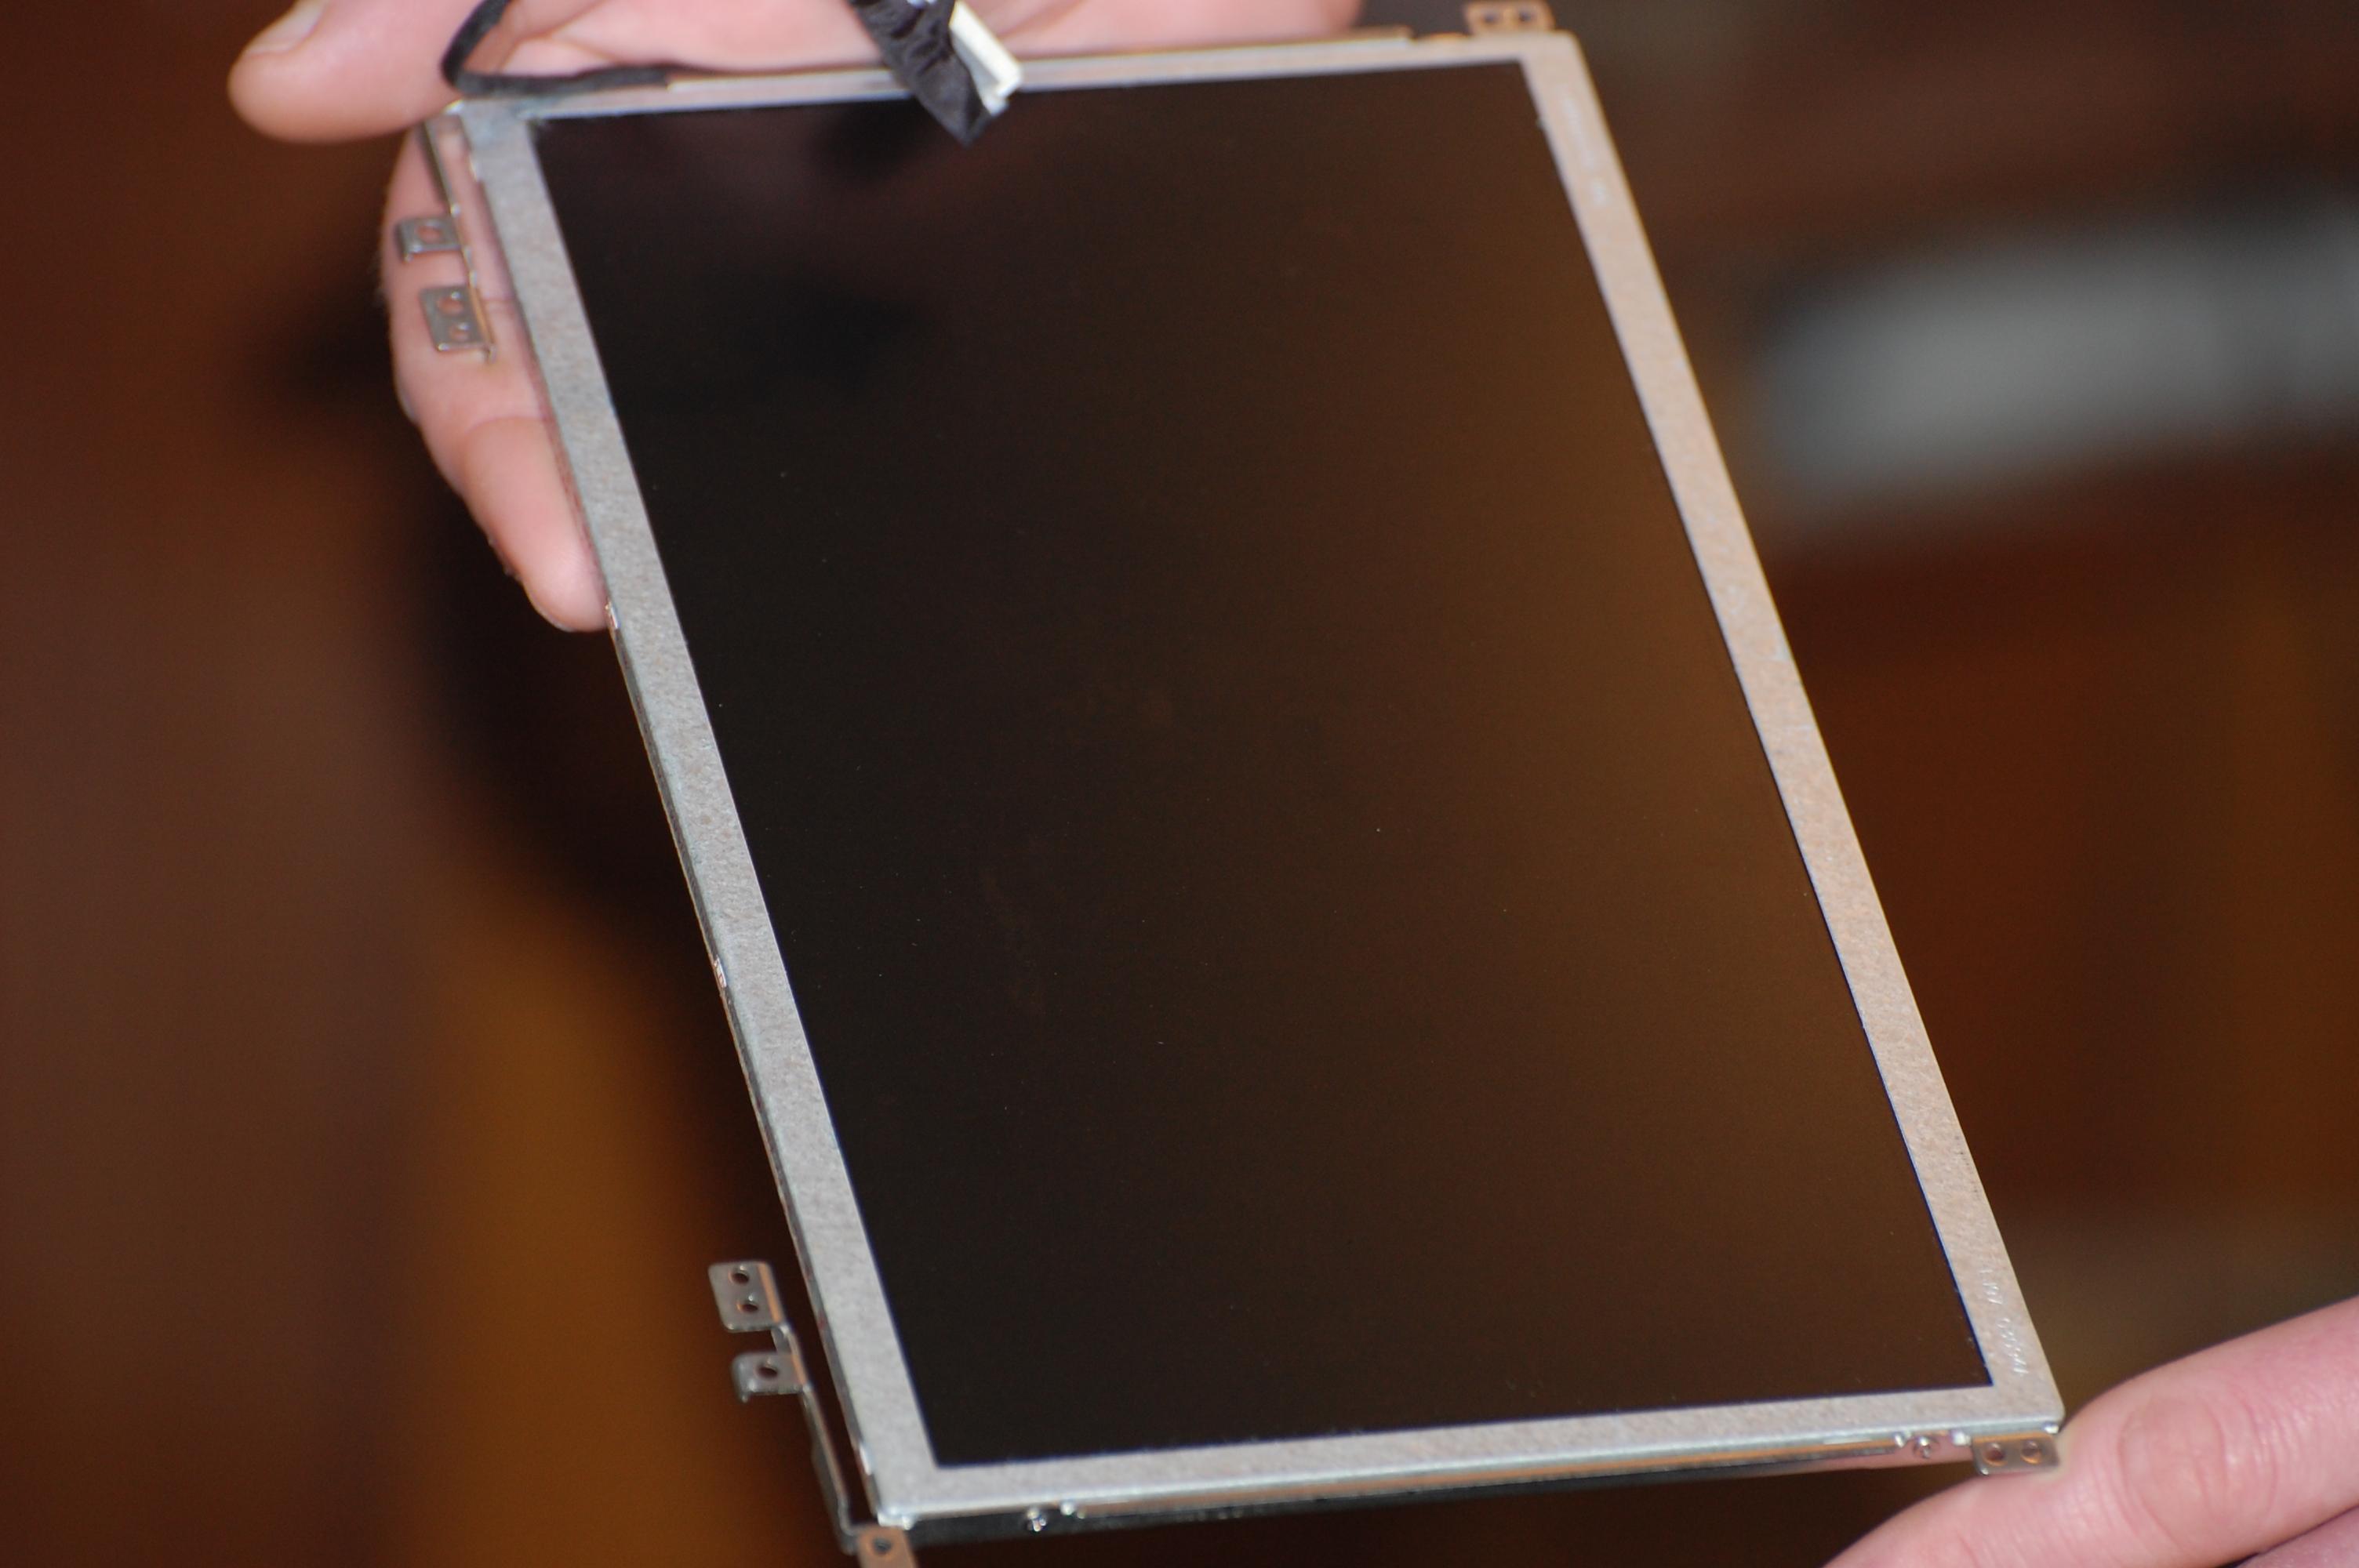 [Sprzedam] Matryca LCD LED SAMSUNG LTN101NT06 10,1 orygina� + ta�ma, do netbooka